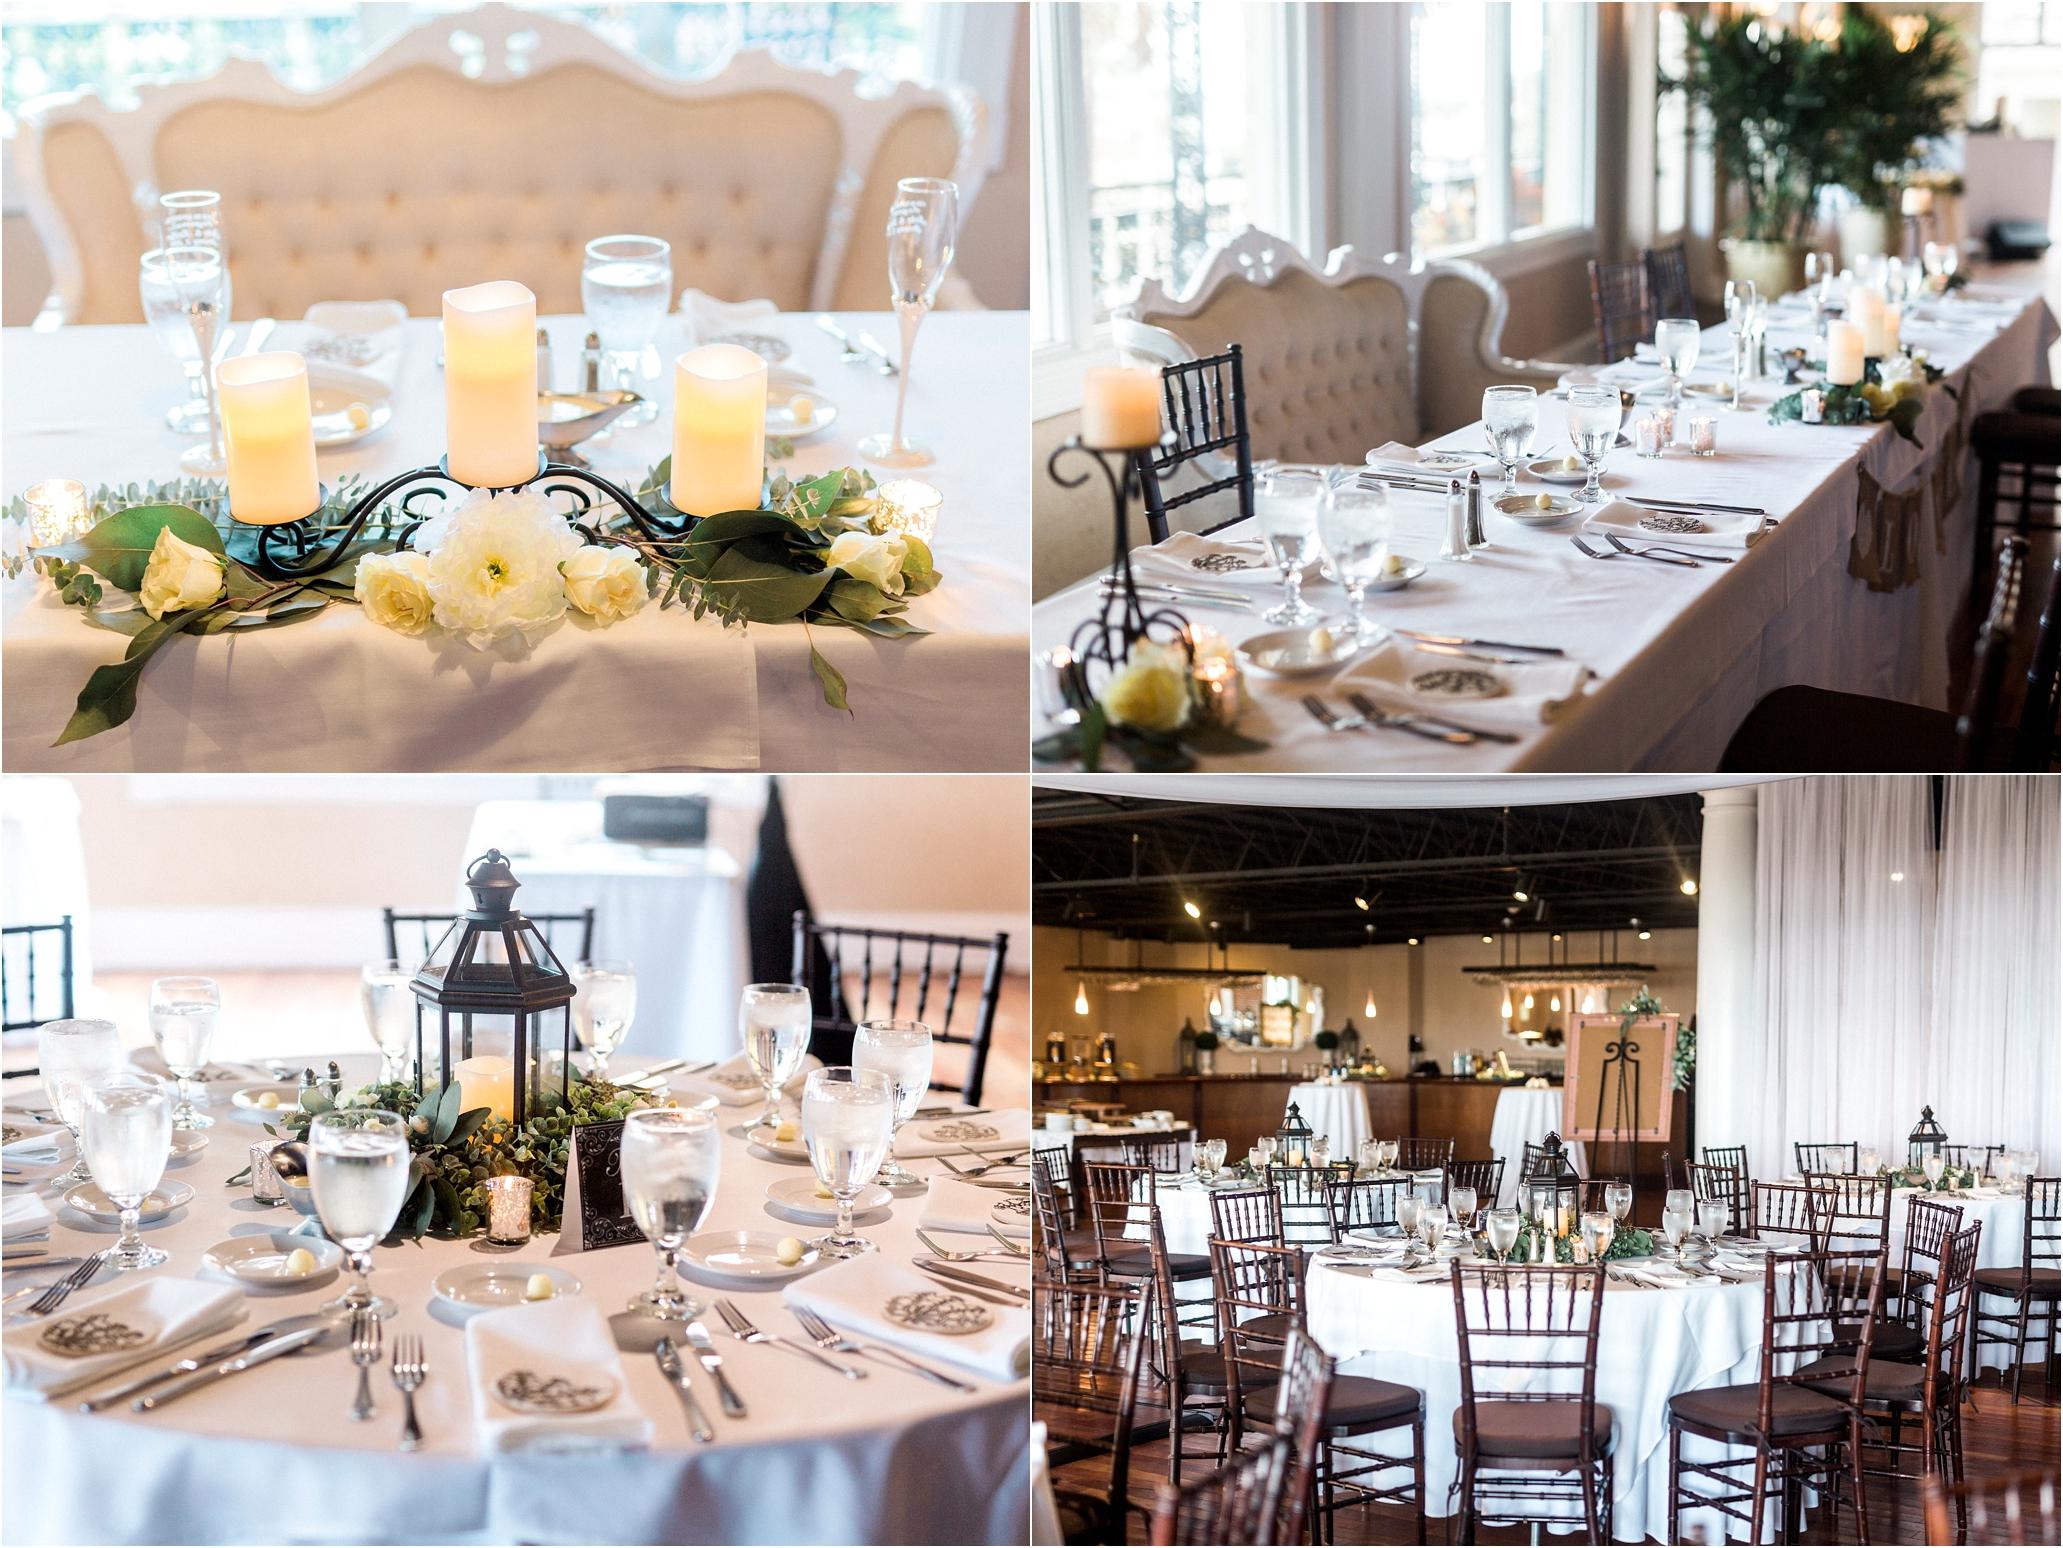 Lisa Silva Photography- Ponte Vedra Beach and Jacksonville, Florida Fine Art Film Wedding Photography- Wedding at The White Room Villa Blanca in St. Augustine, Florida_0063.jpg